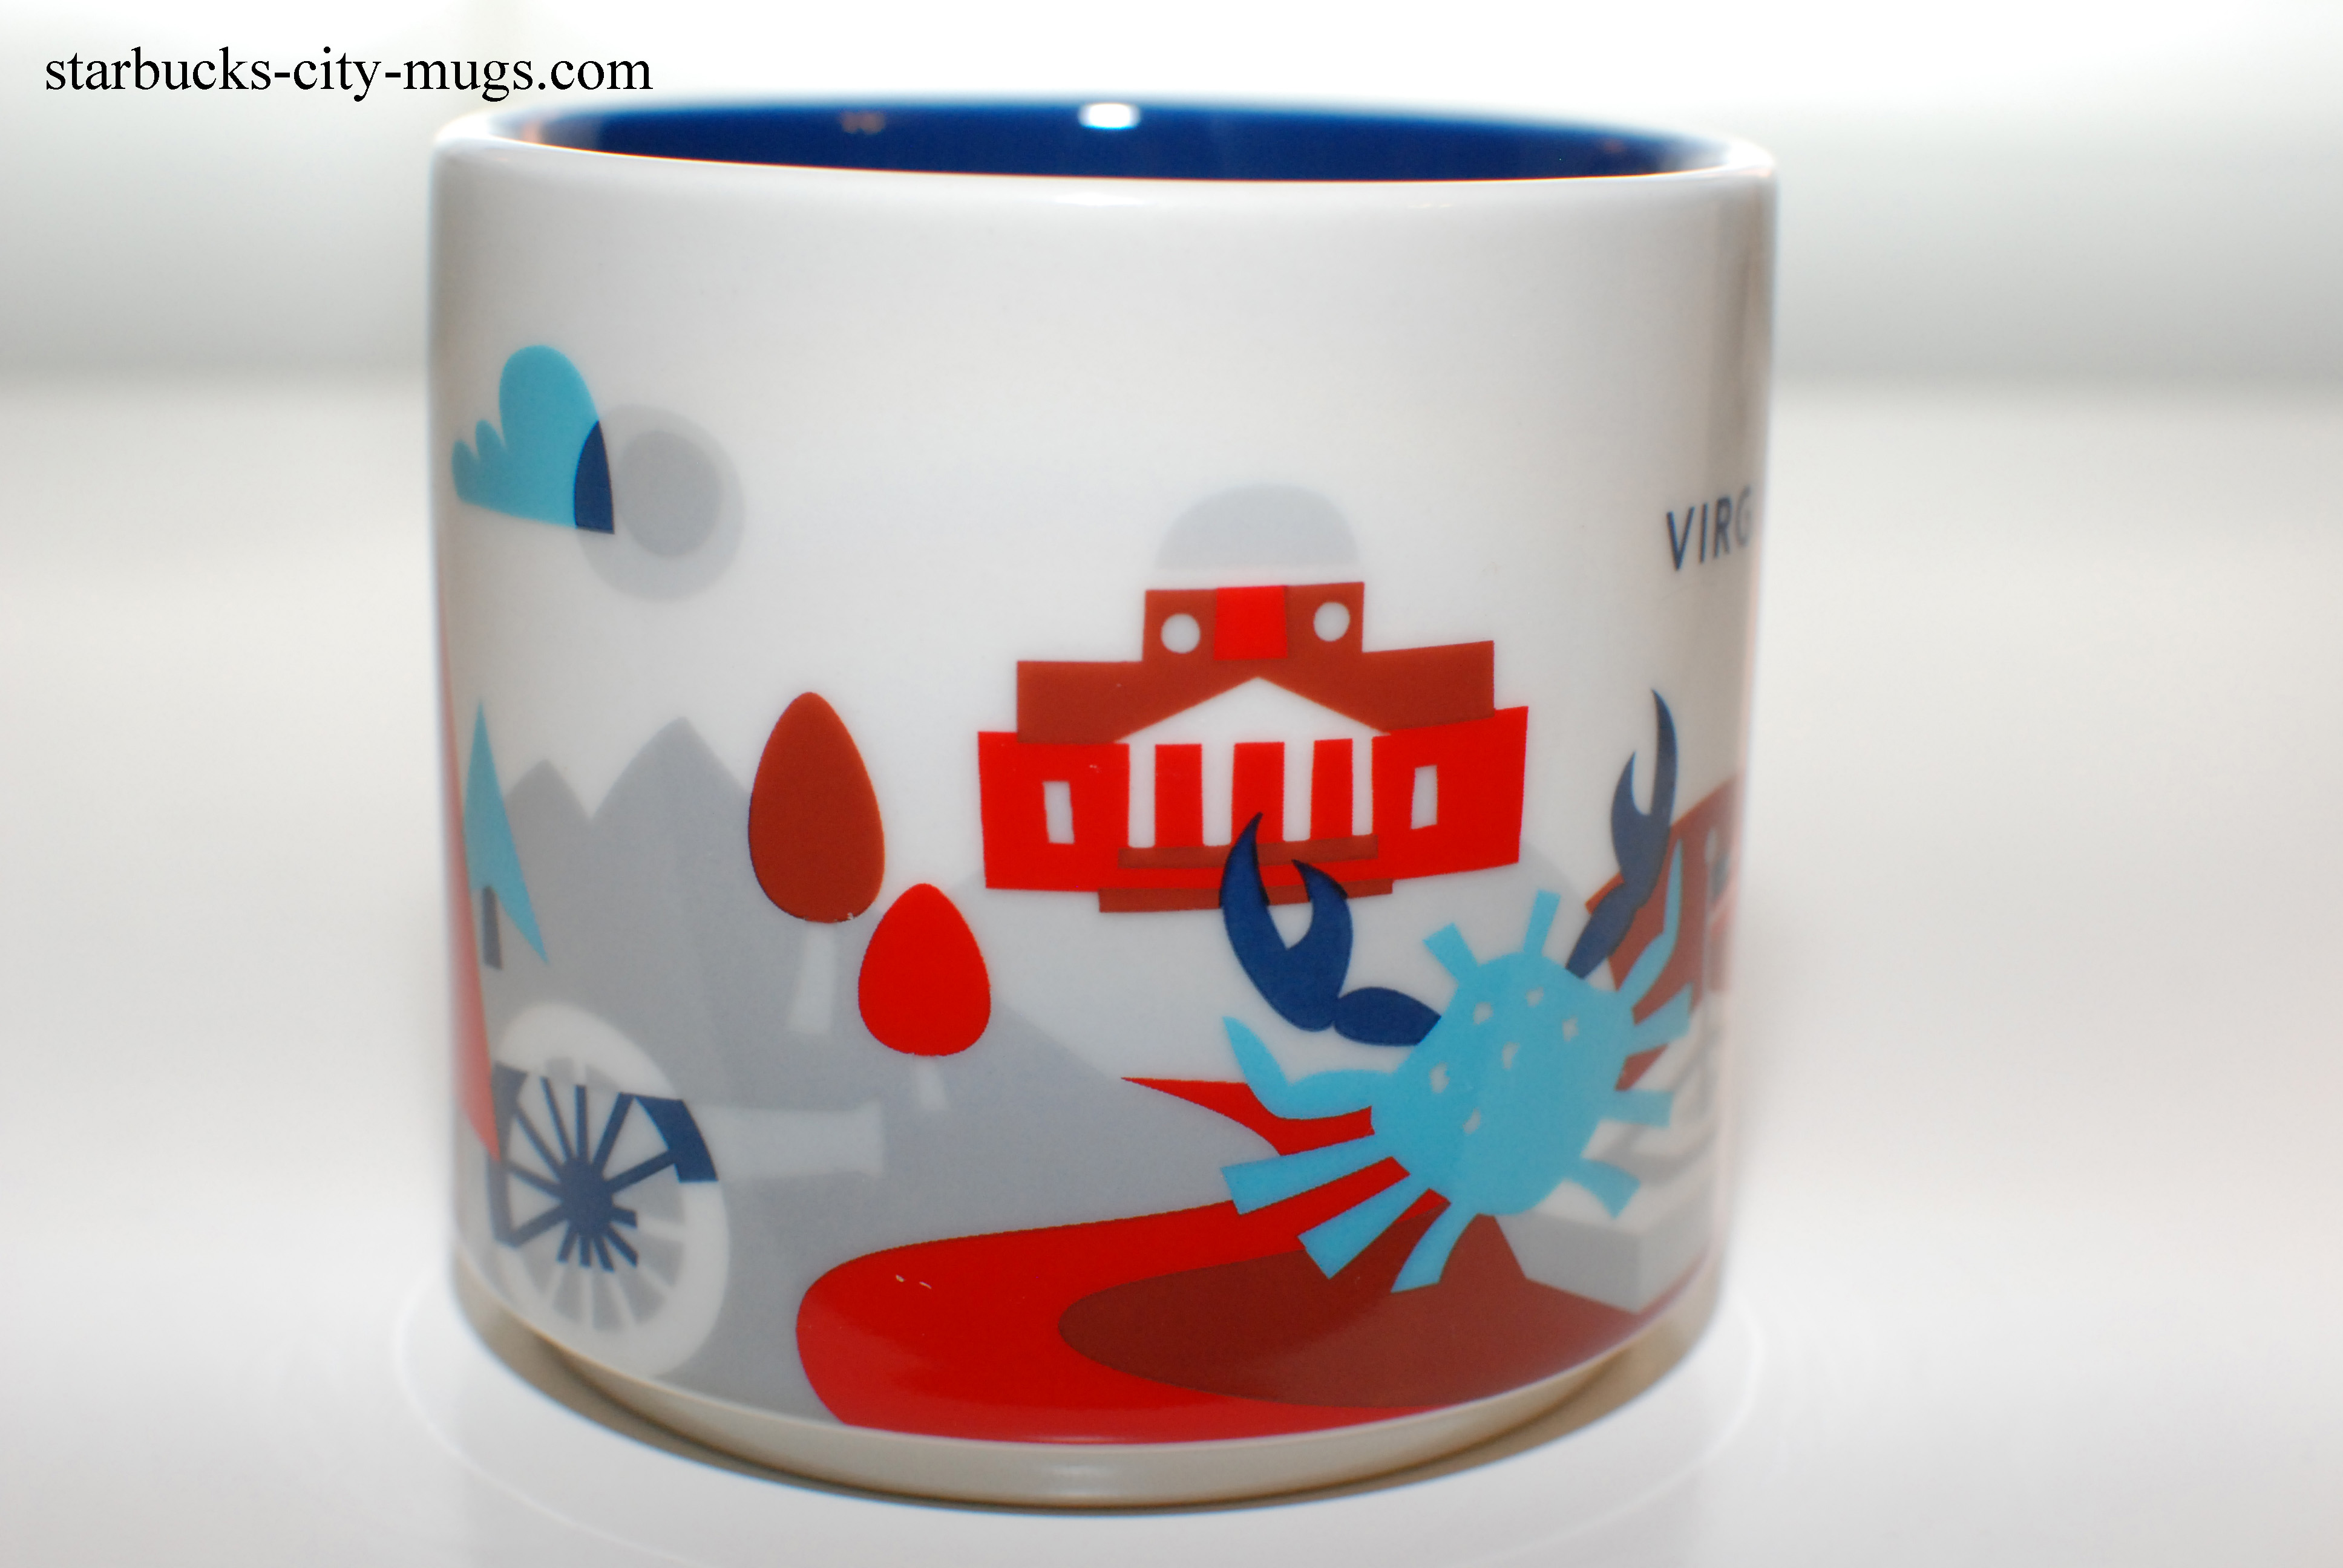 virginia ornament starbucks city mugs. Black Bedroom Furniture Sets. Home Design Ideas